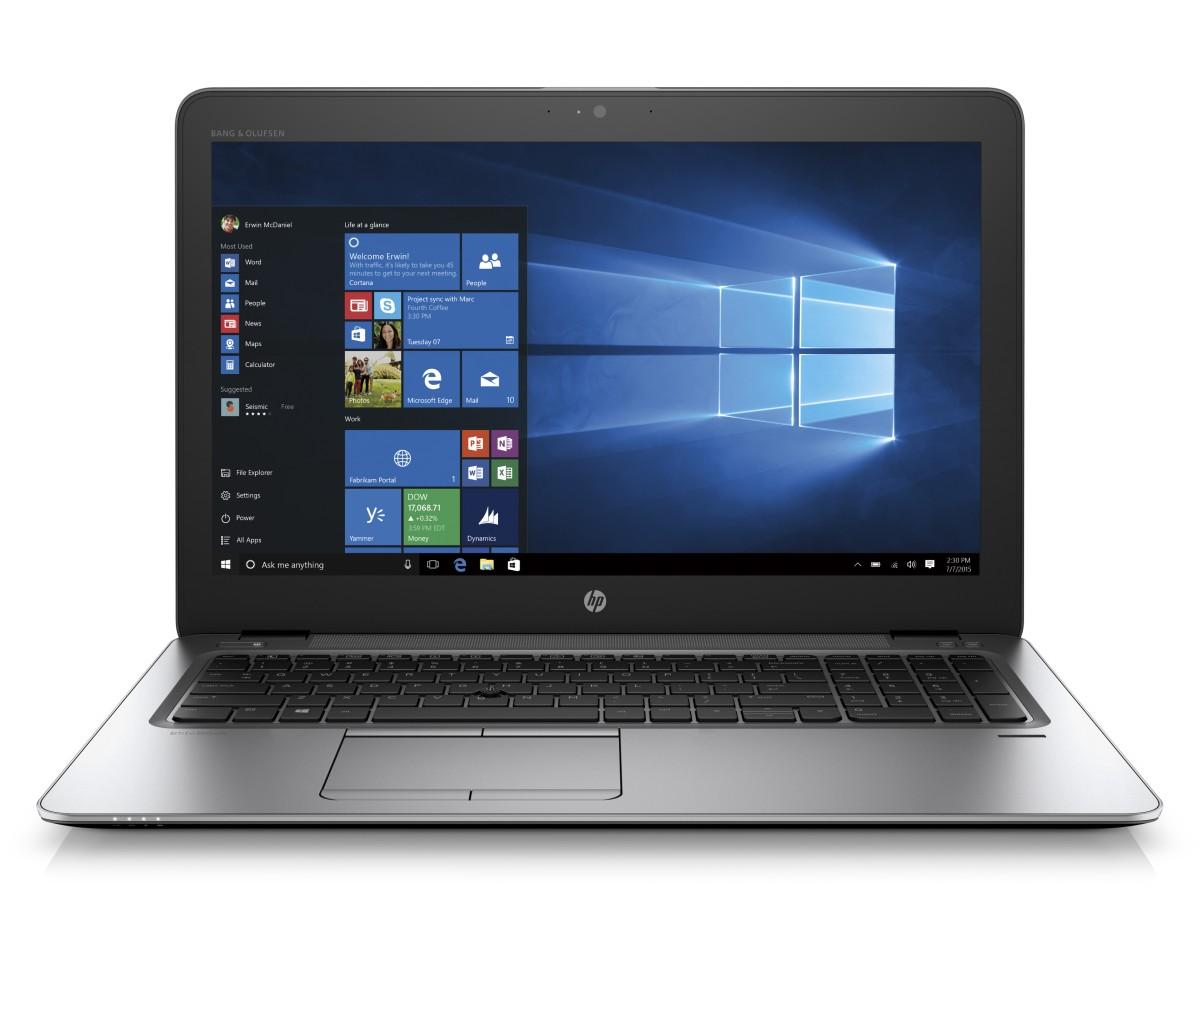 HP EliteBook 850 G4 i7-7500U/16GB/512GB SSD + 2,5'' slot/ AMD Radeon R7 / 15,6'' FHD/backlit keyb, lt4132/Win 10 Pro